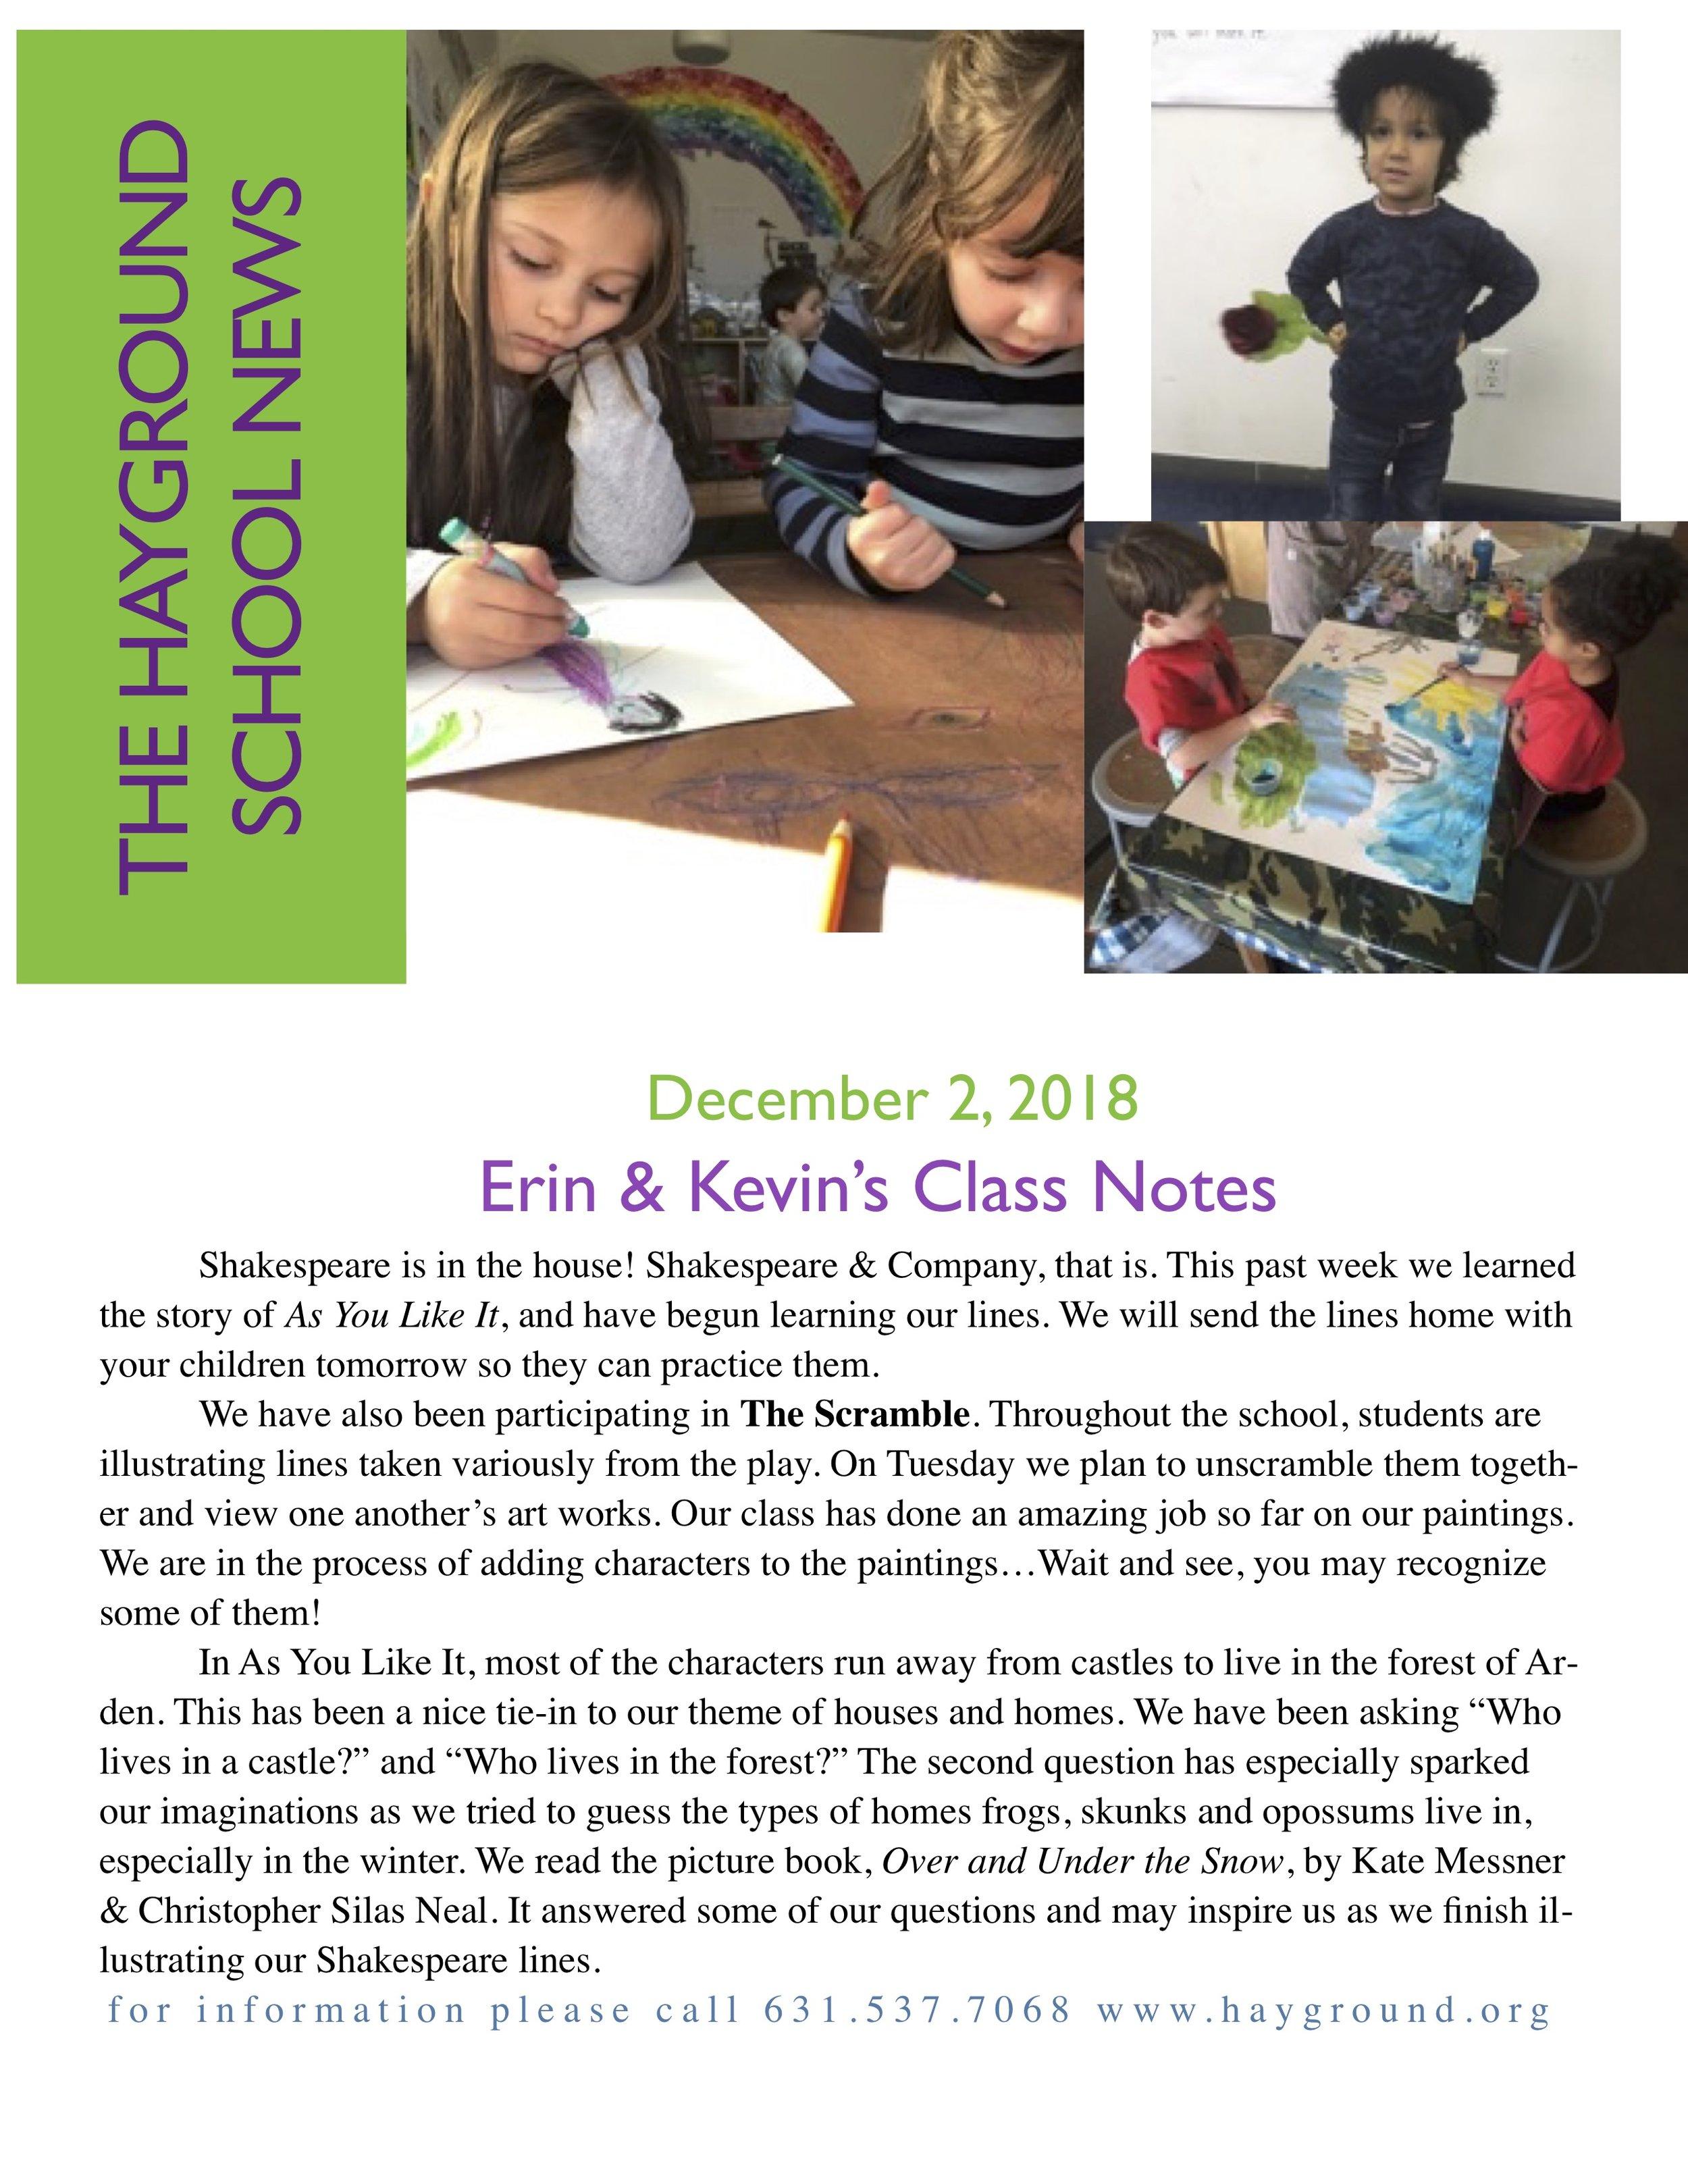 Erin & Kevins class notes december 2 copy.jpg